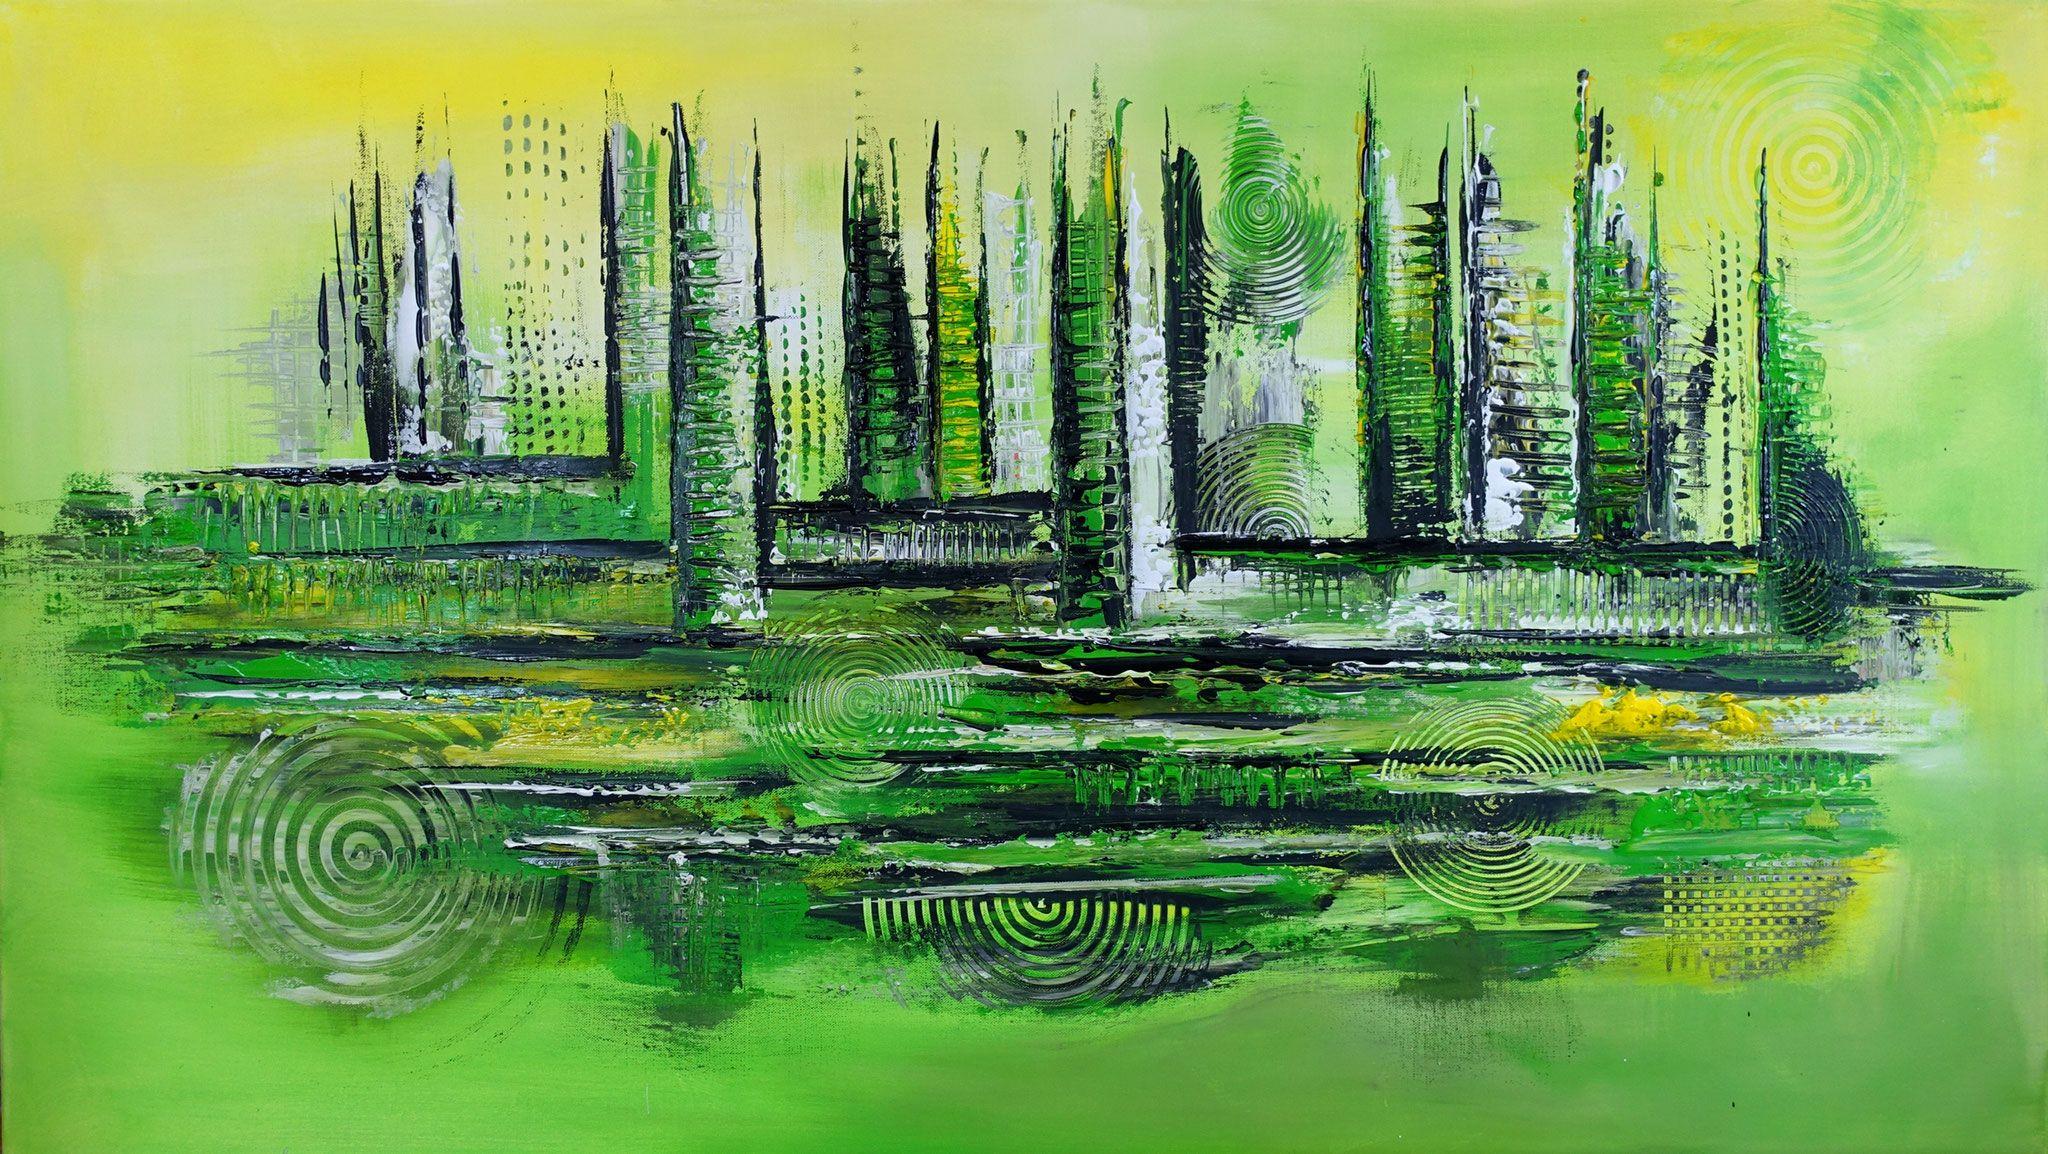 abstraktes leinwandbild grun grau unikat original gemalde ori abstrakte malerei leinwandbilder abstrakt geometrische abstraktion künstler kunst rot schwarz